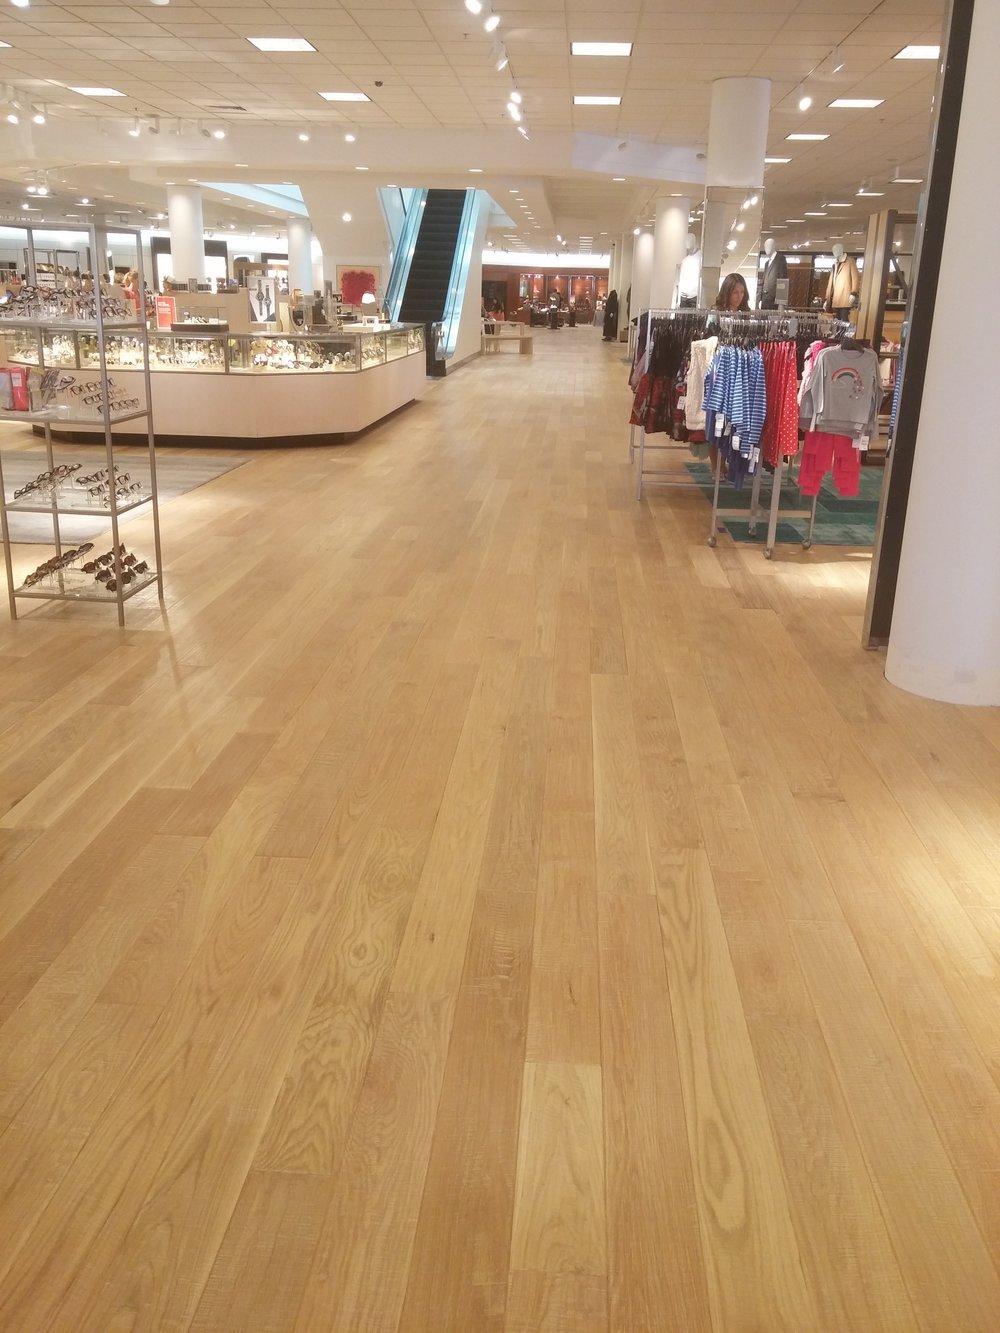 Major Retail-0002.jpg